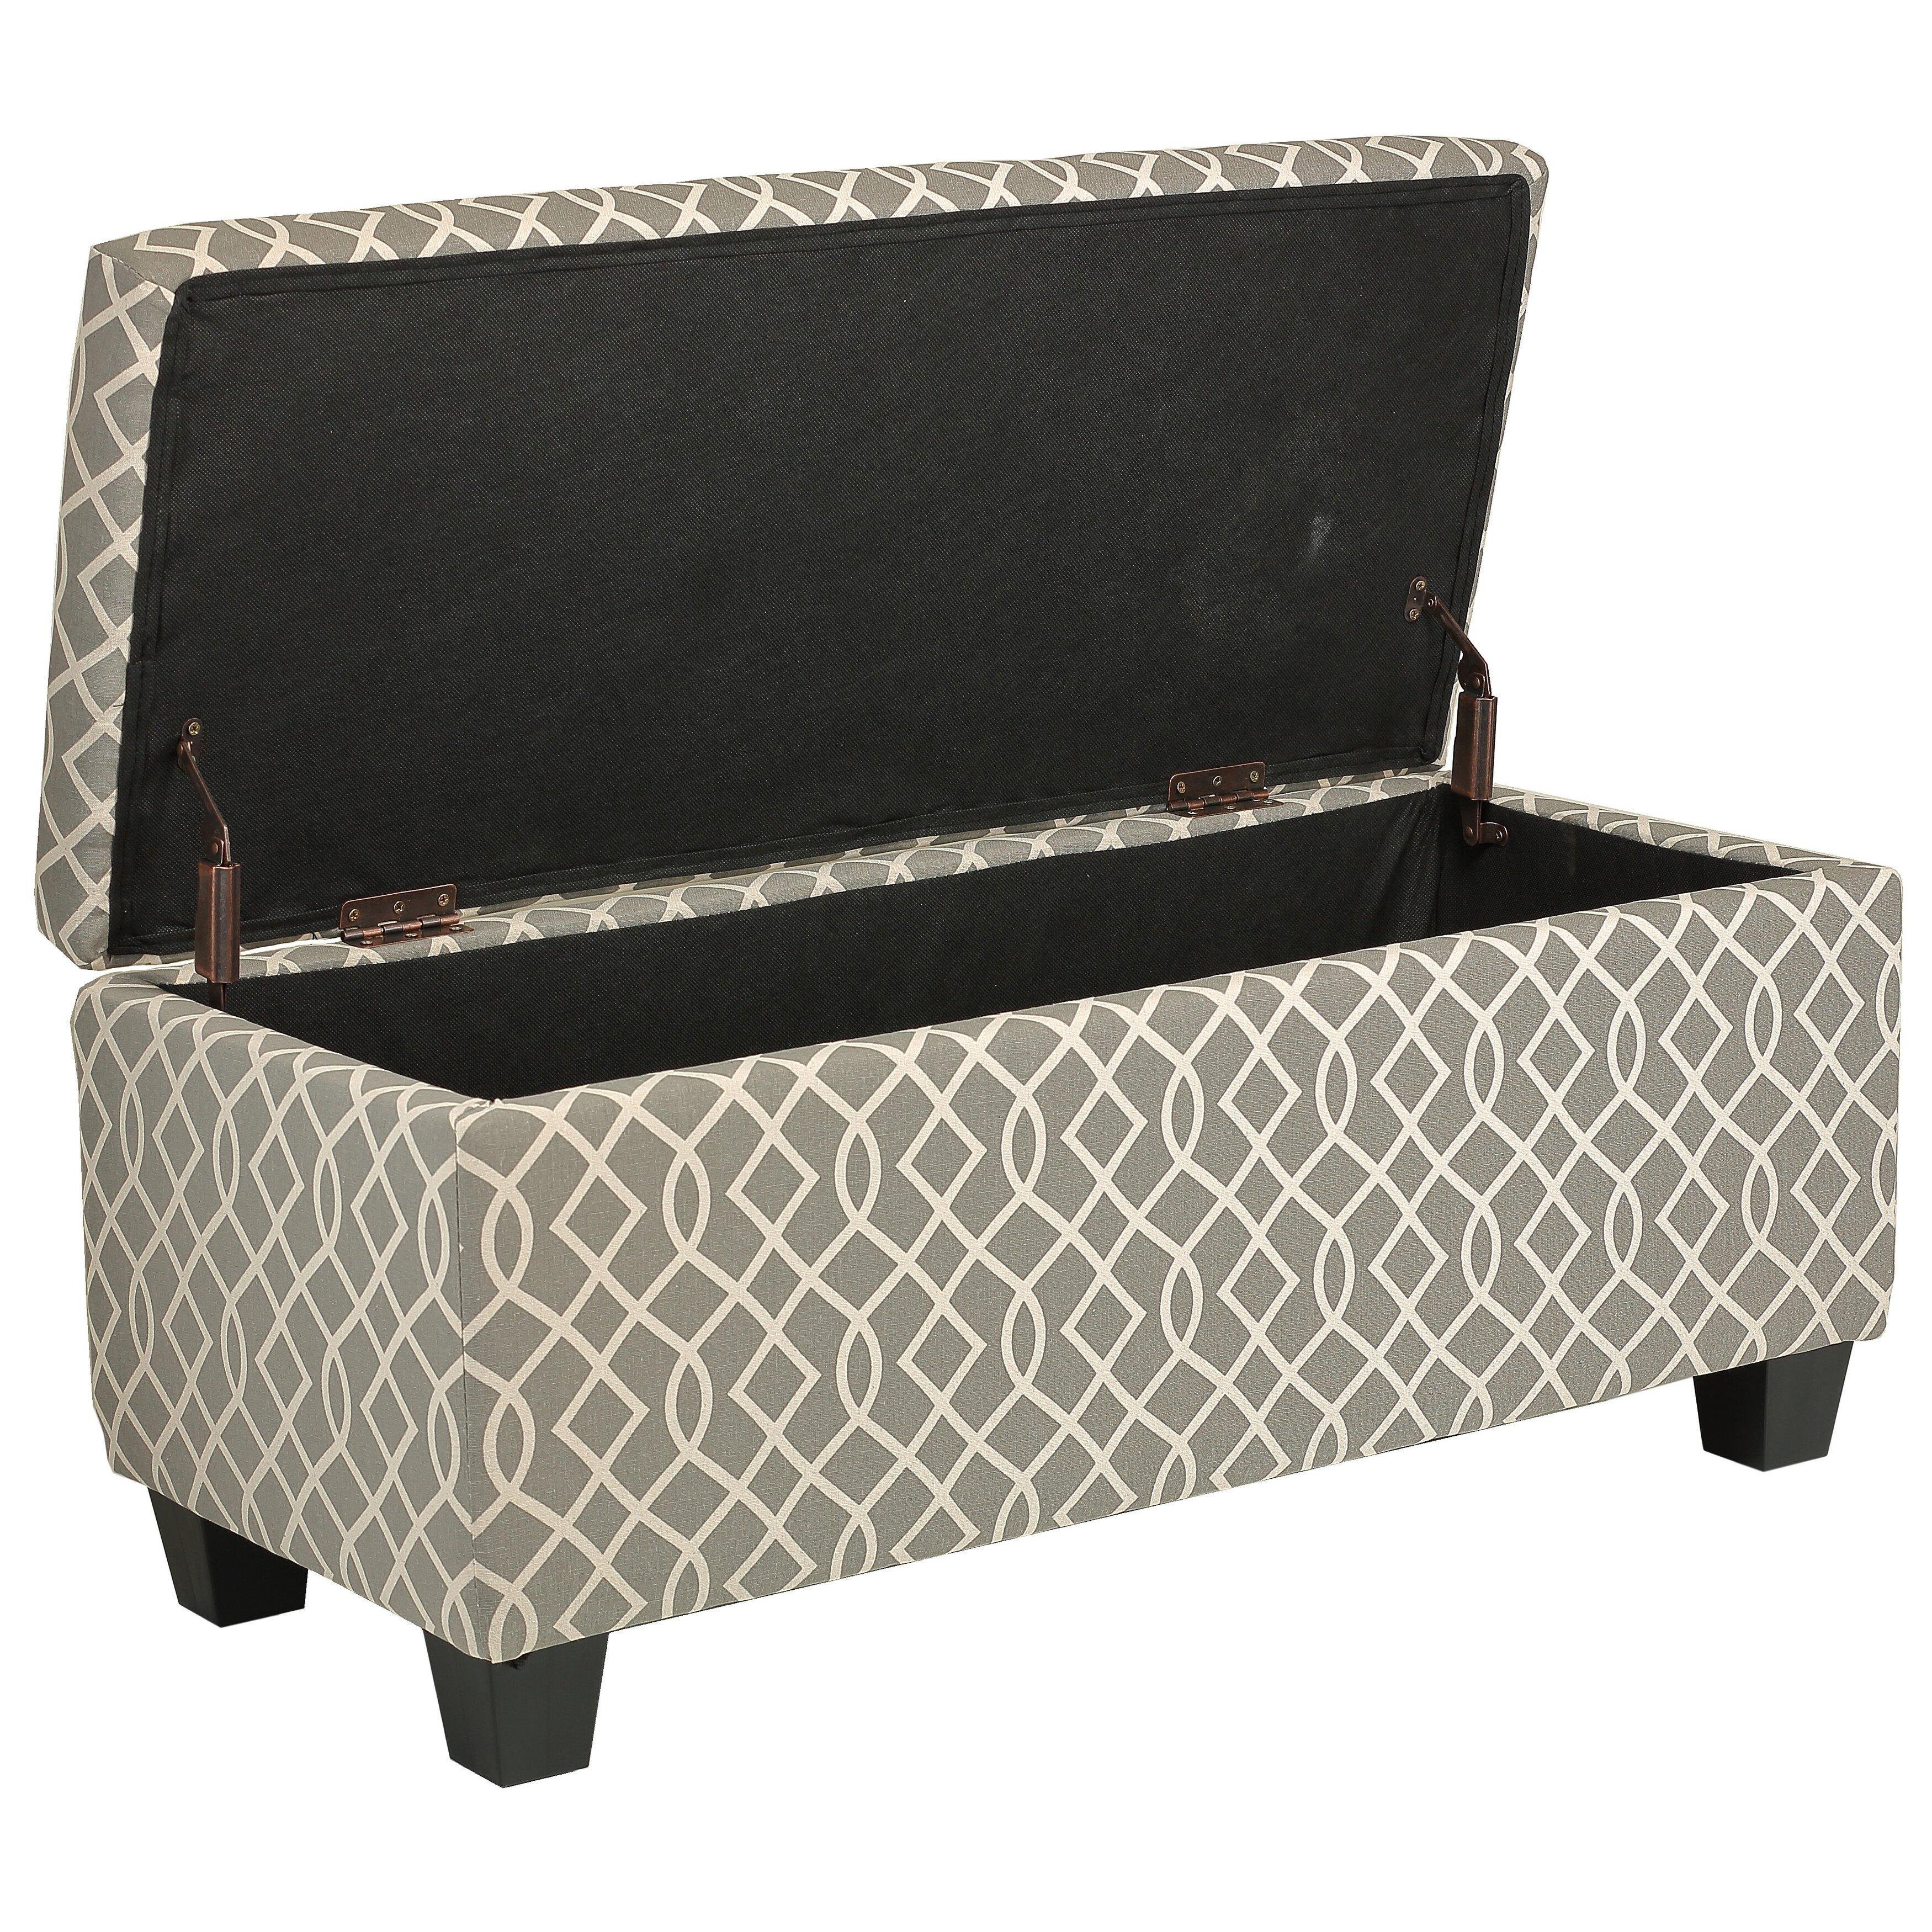 cortesi home kiki wood storage bedroom bench & reviews   wayfair